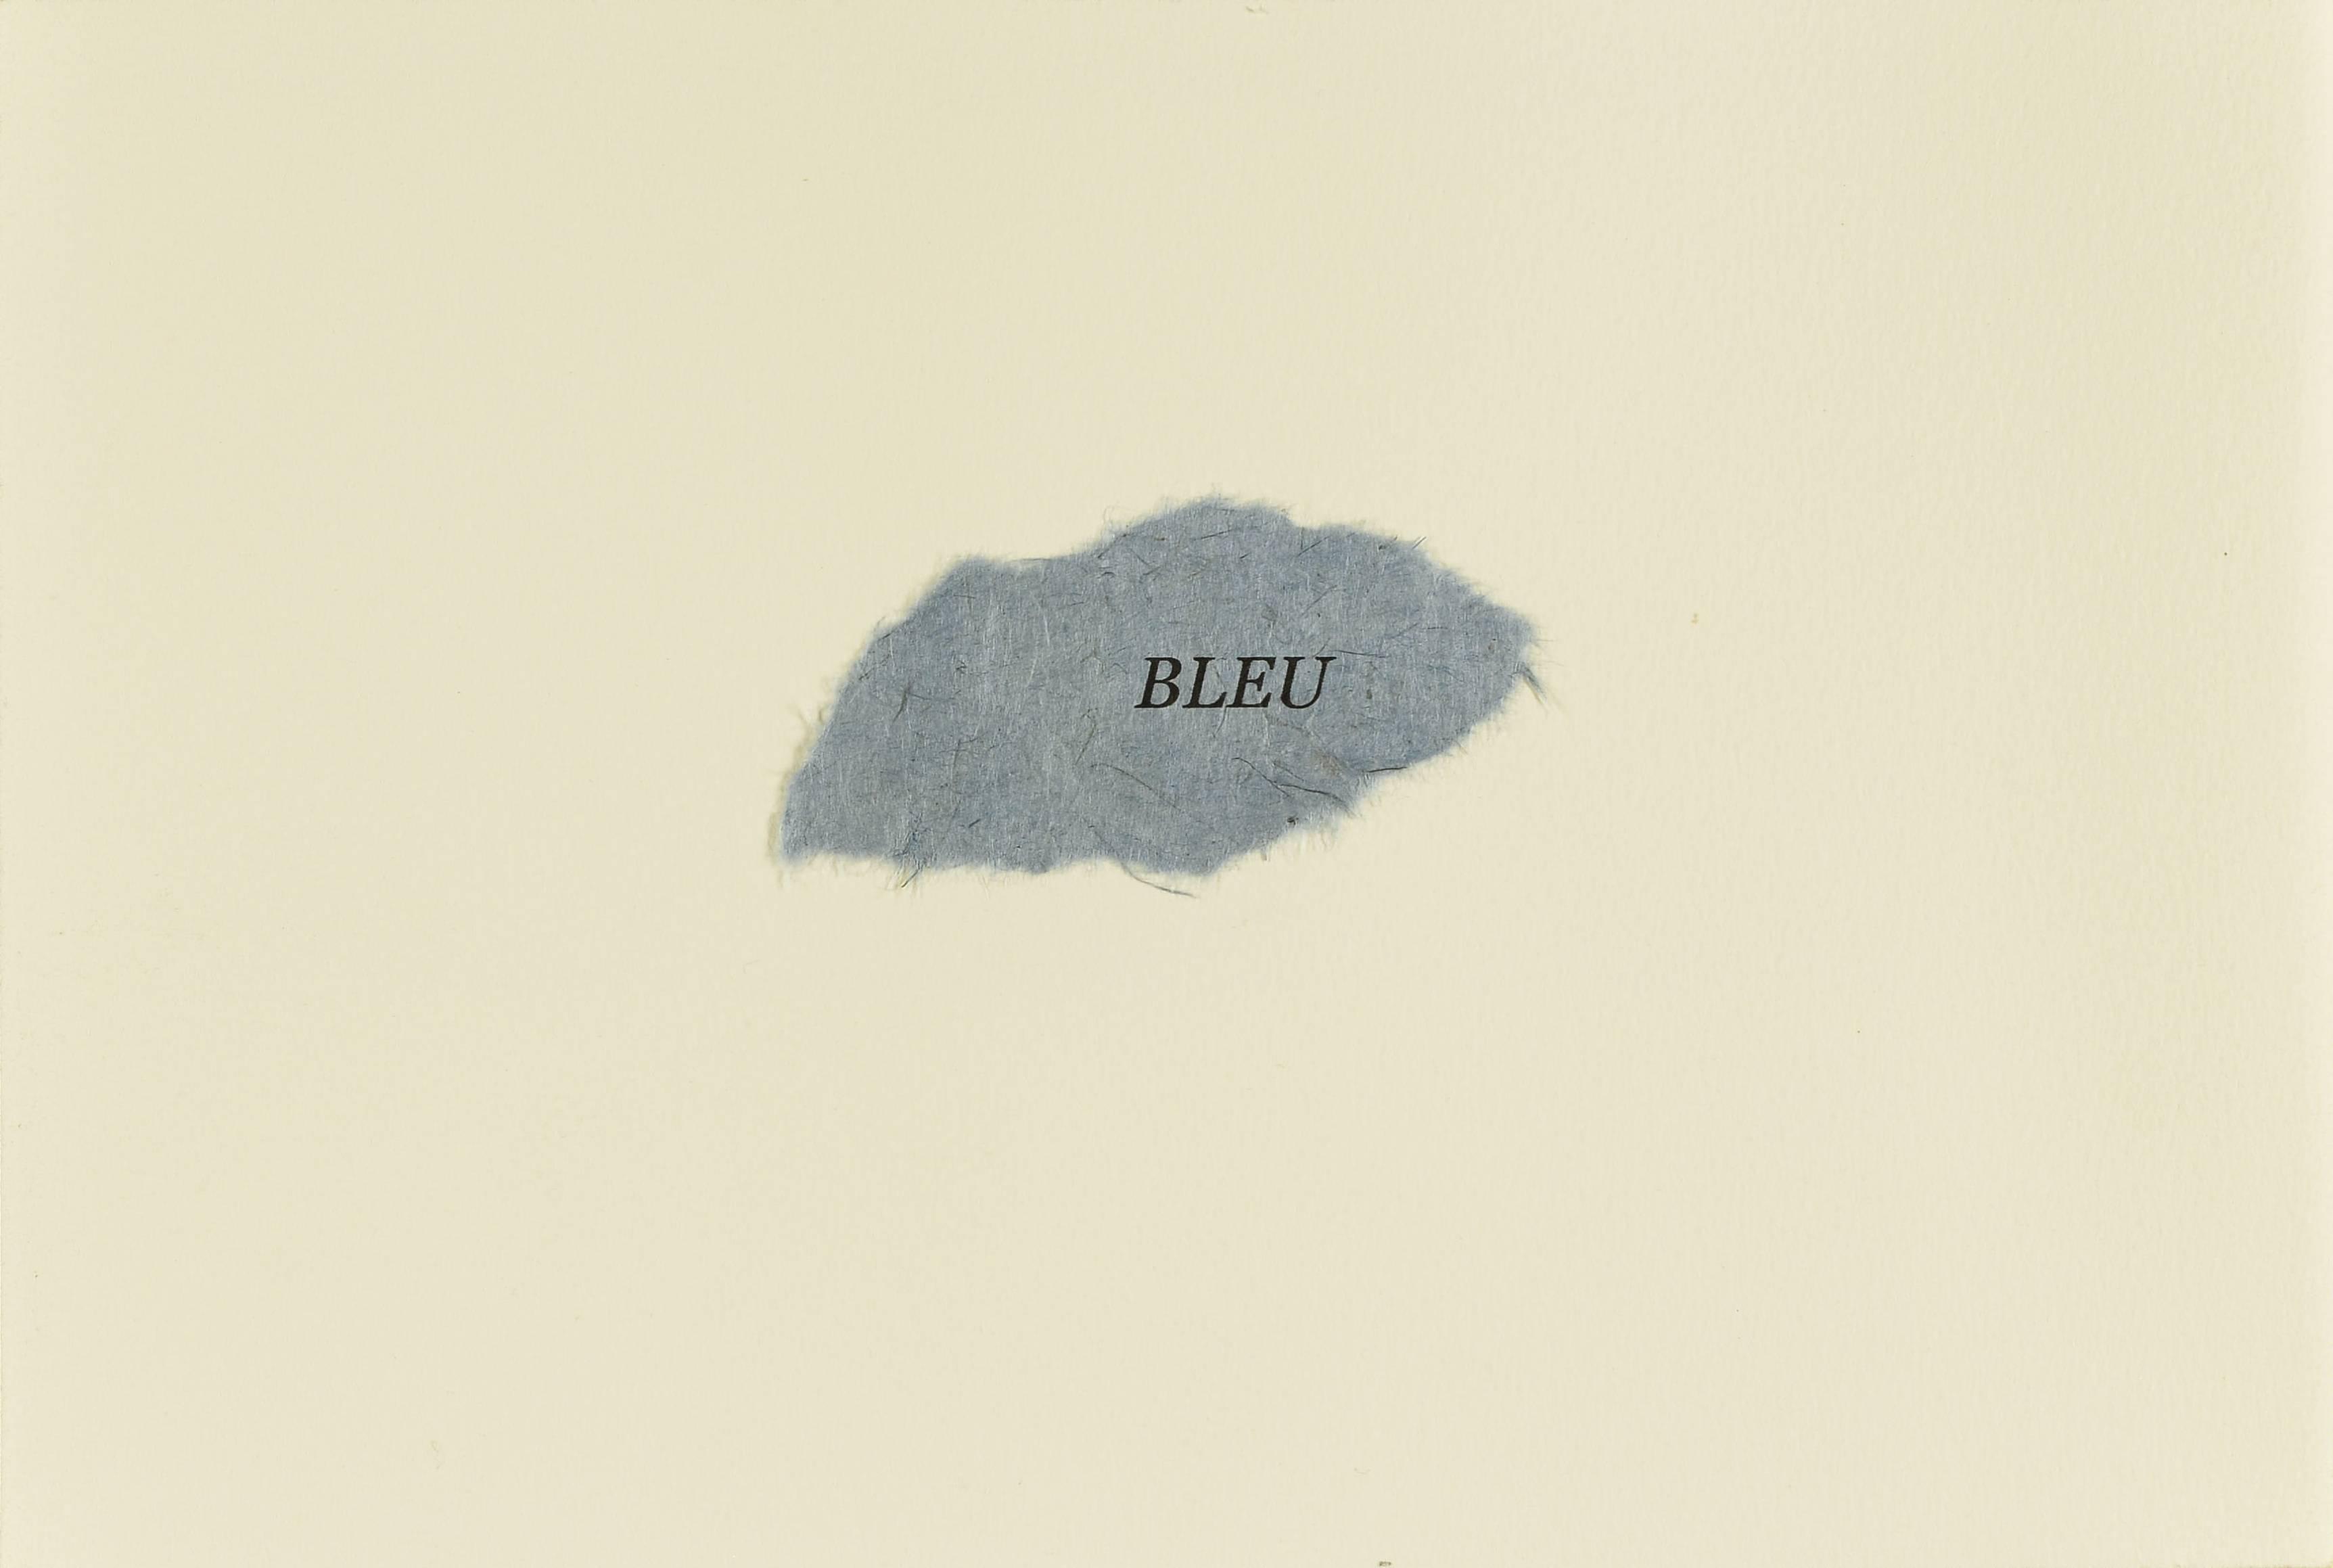 Contenu du Bleu